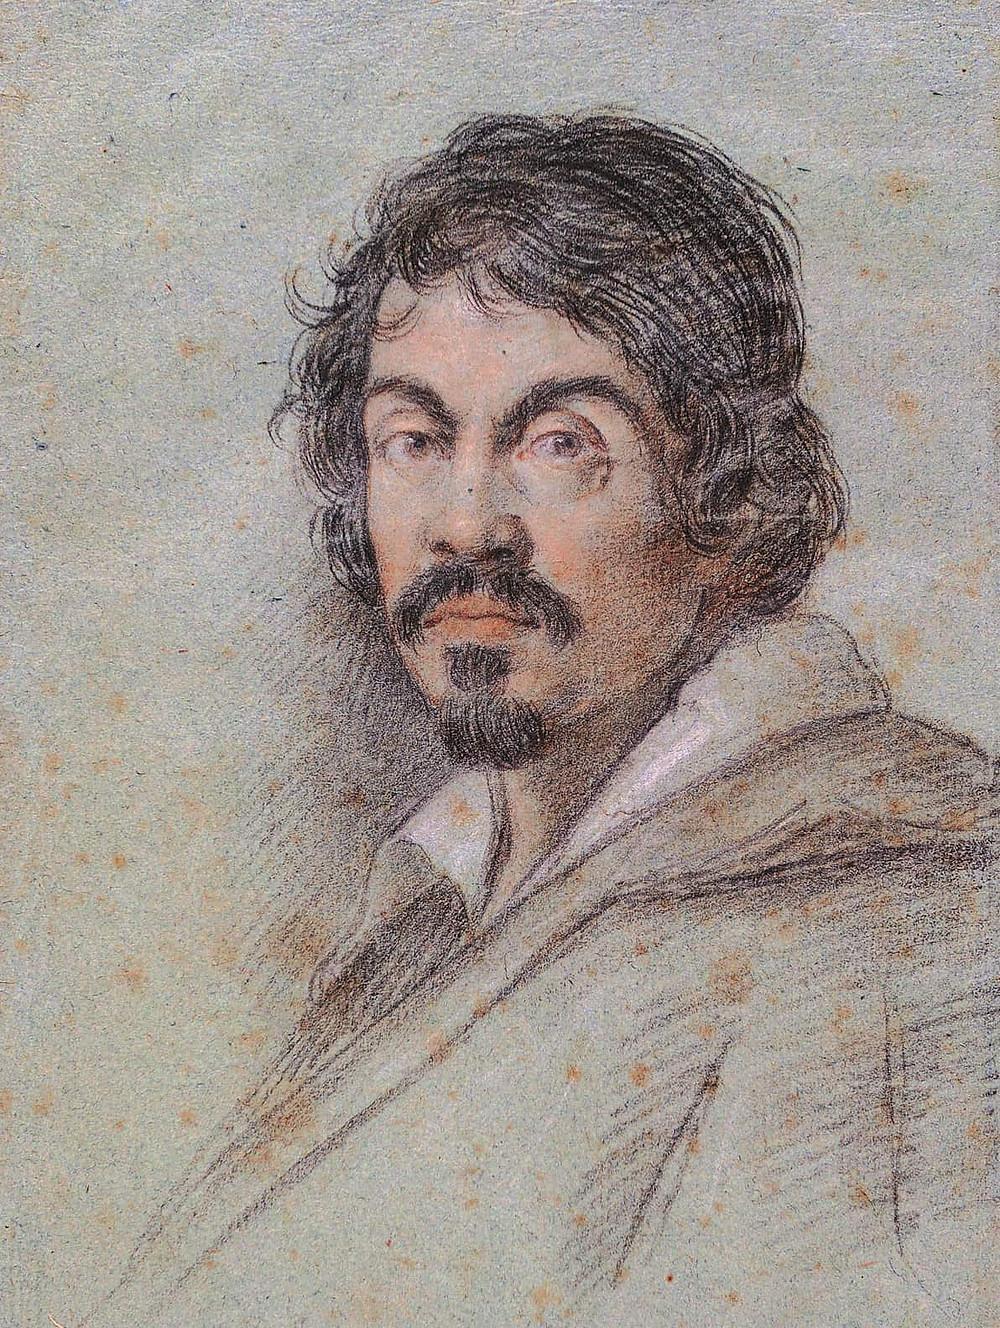 Ottavio Leoni, Portrait of Caravaggio, 1620